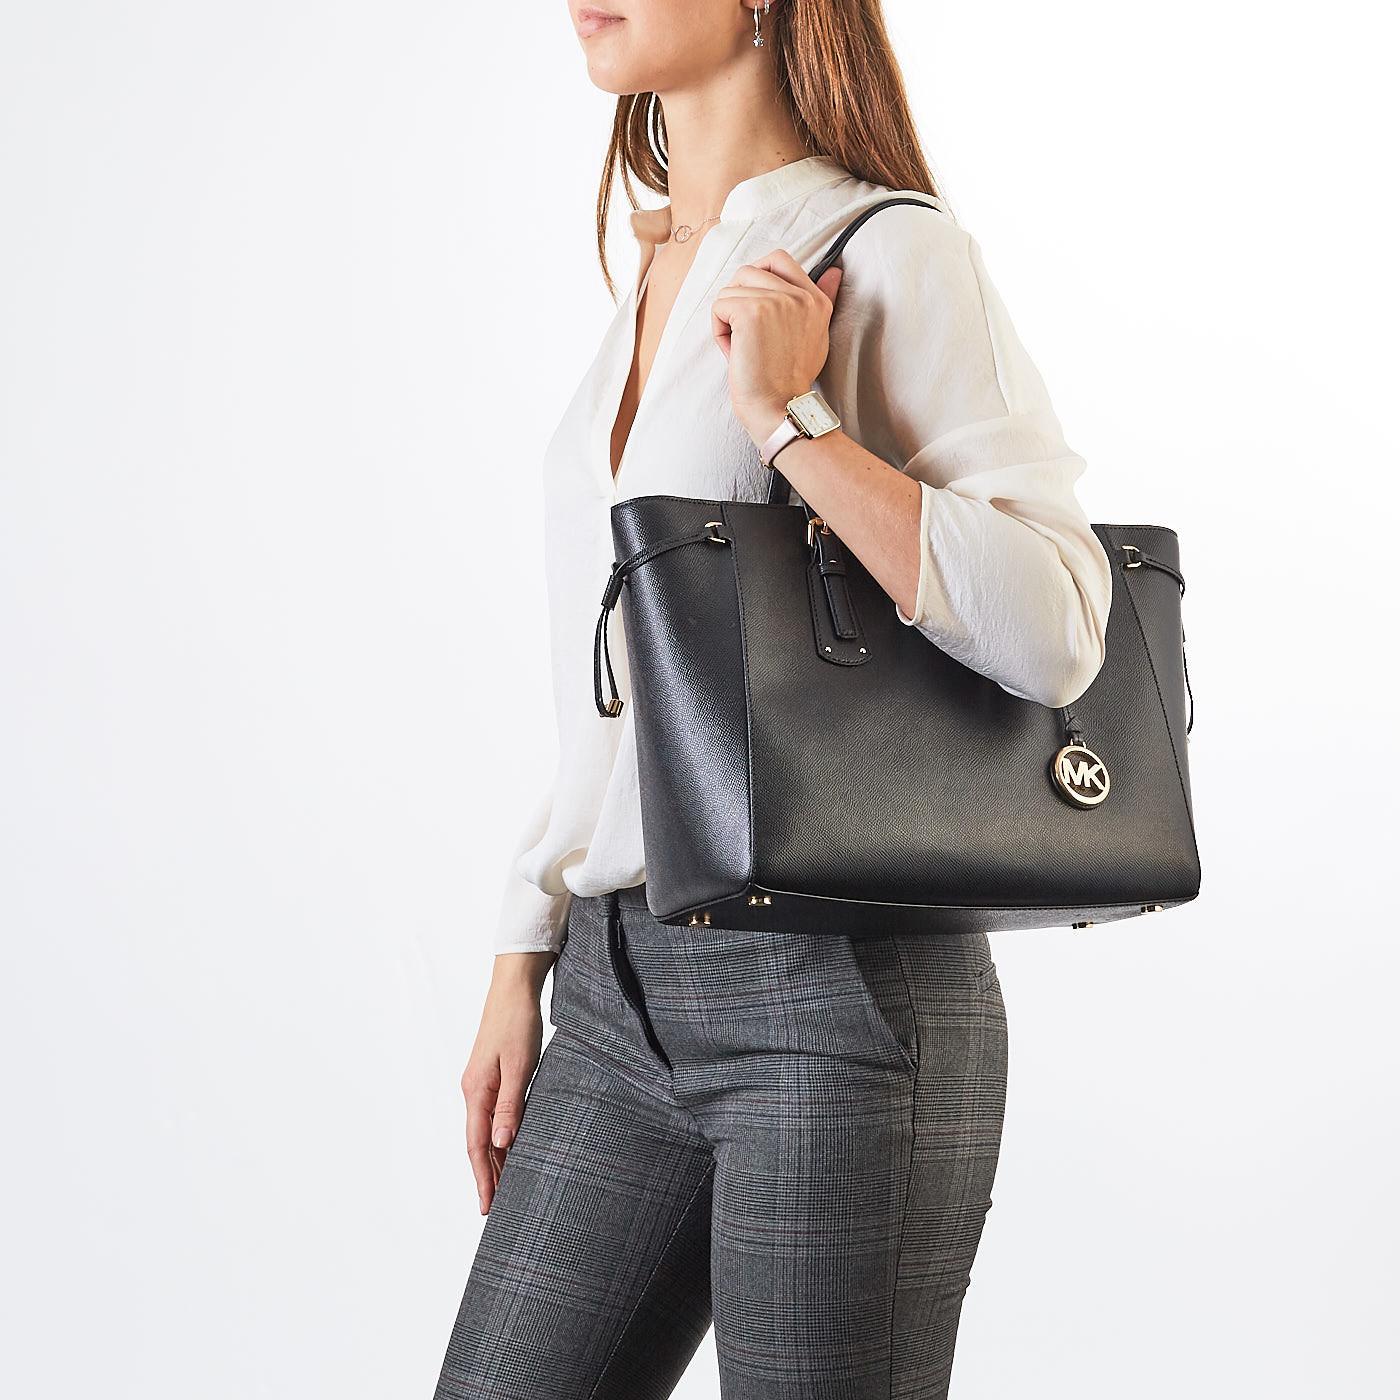 Michael Kors Voyager shopper 30H7GV6T8L 001 Bags